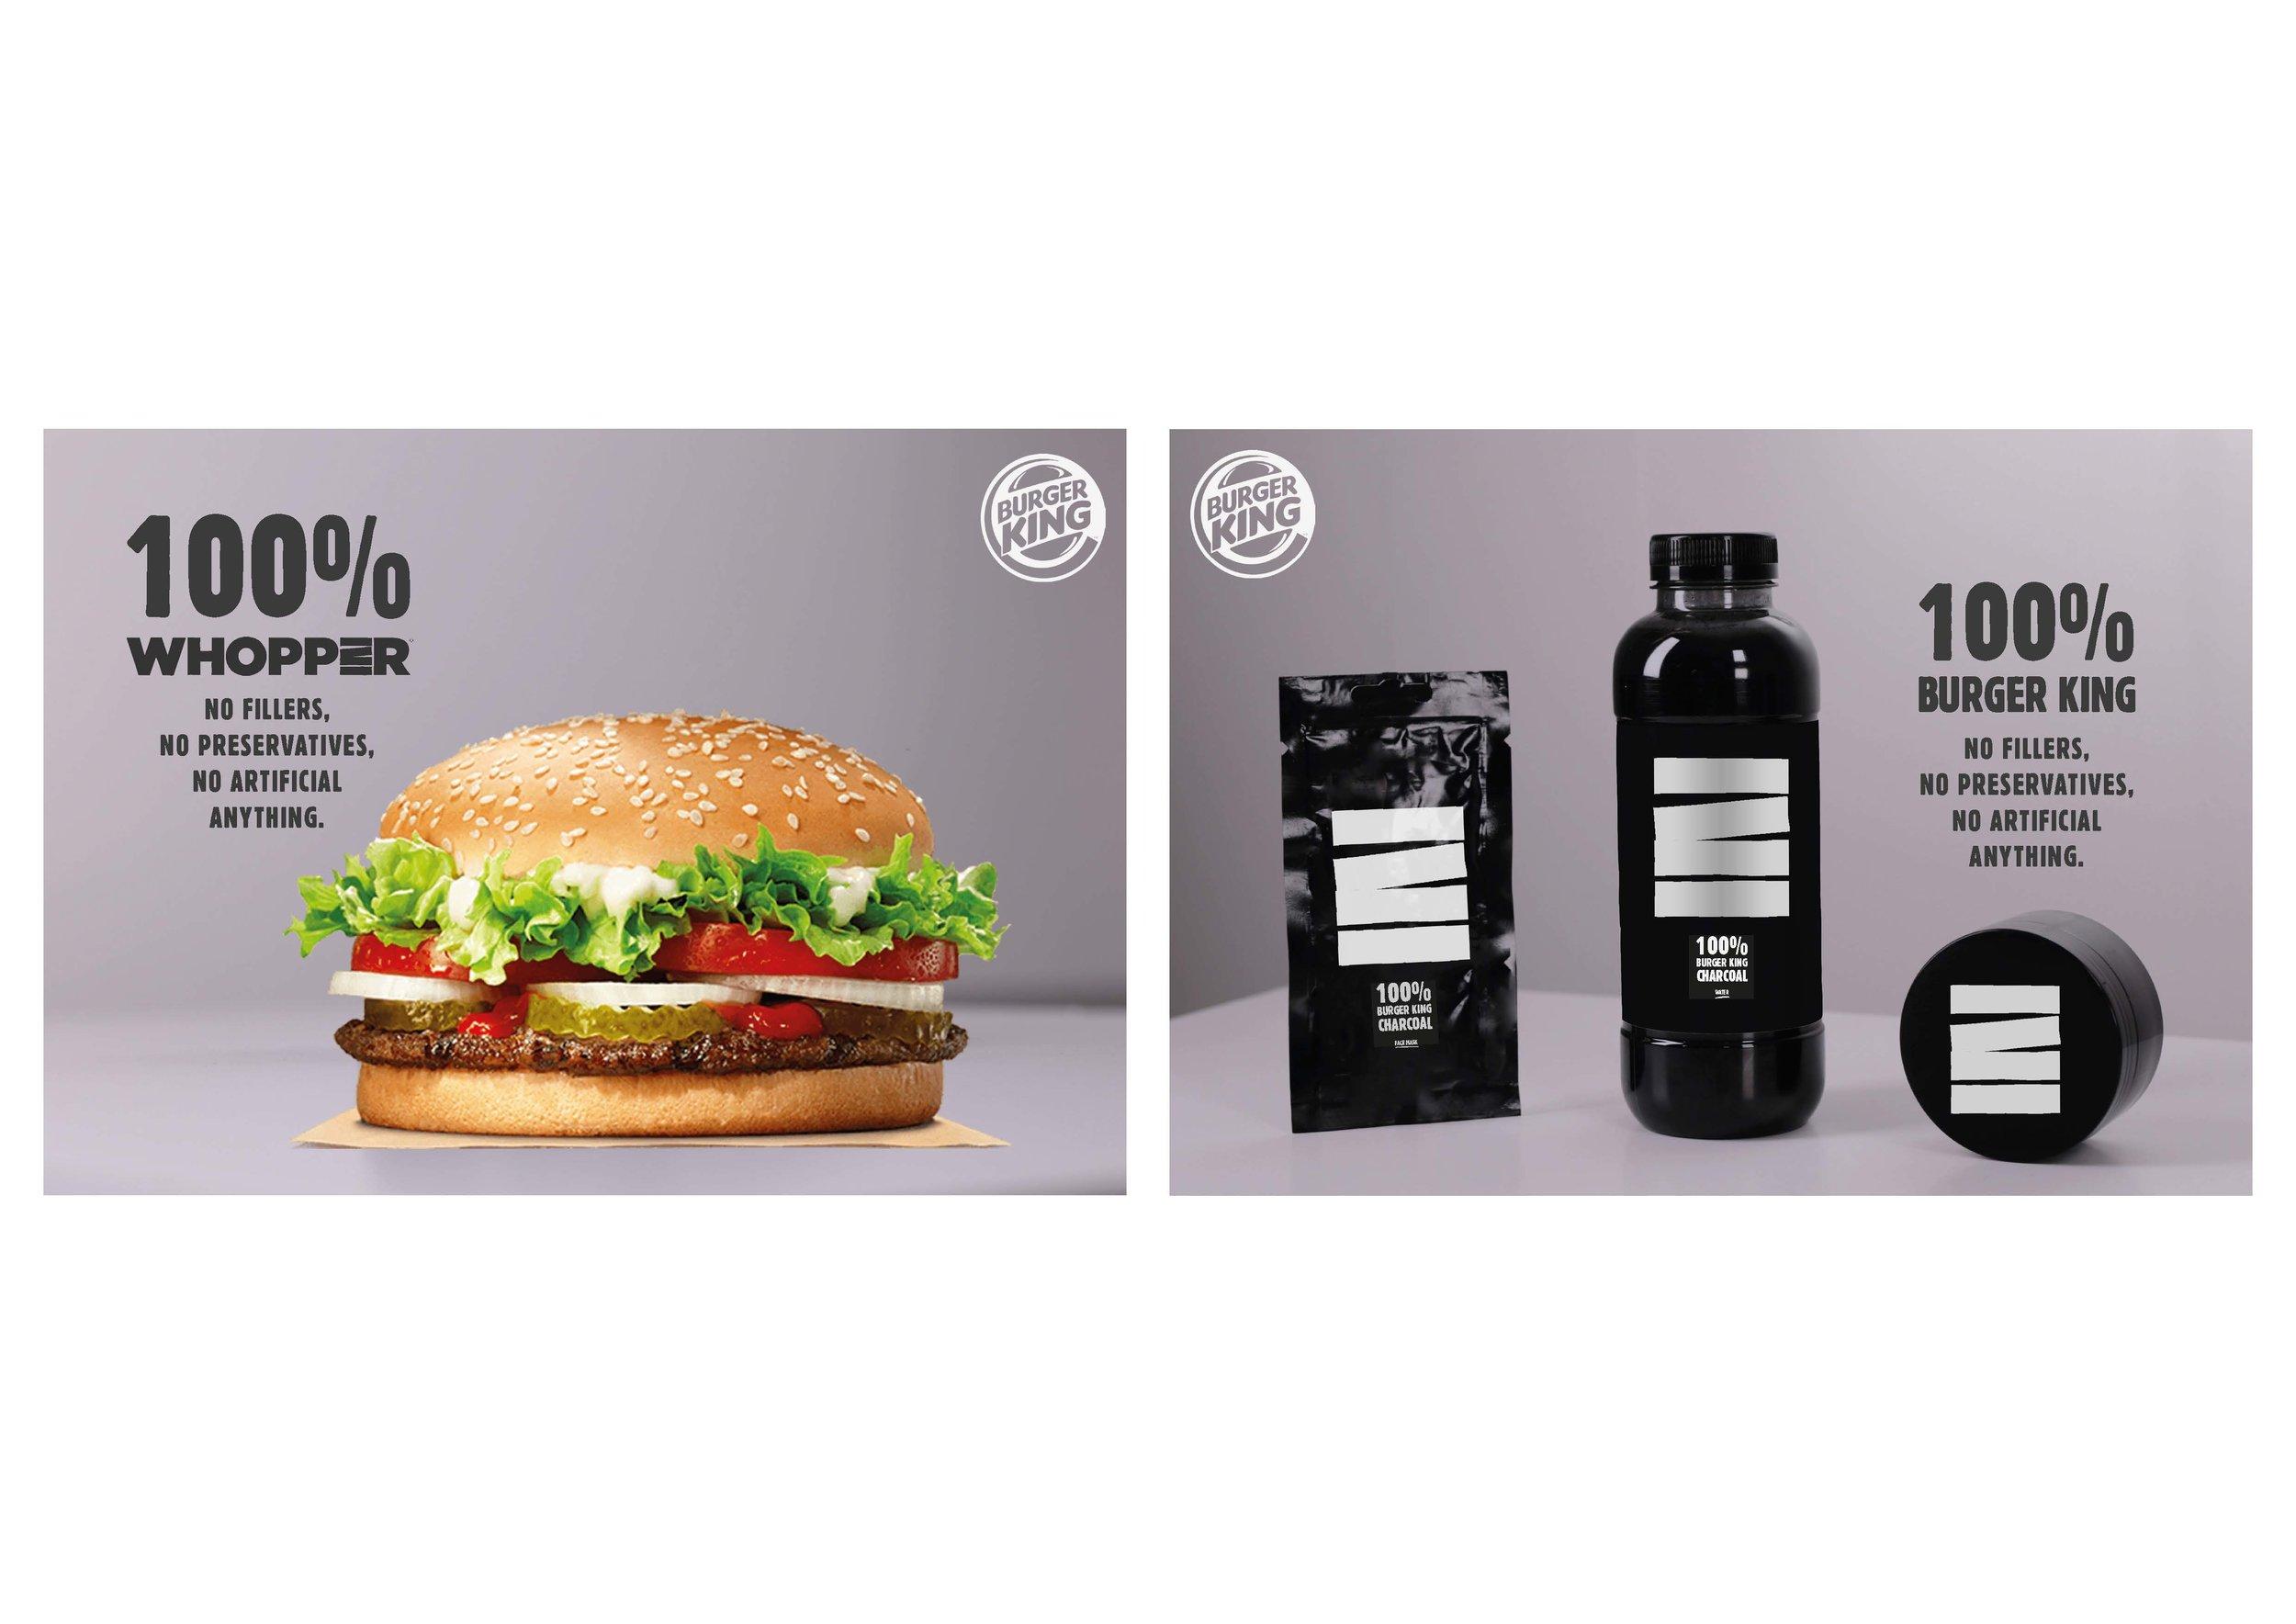 burger king_Page_2.jpg